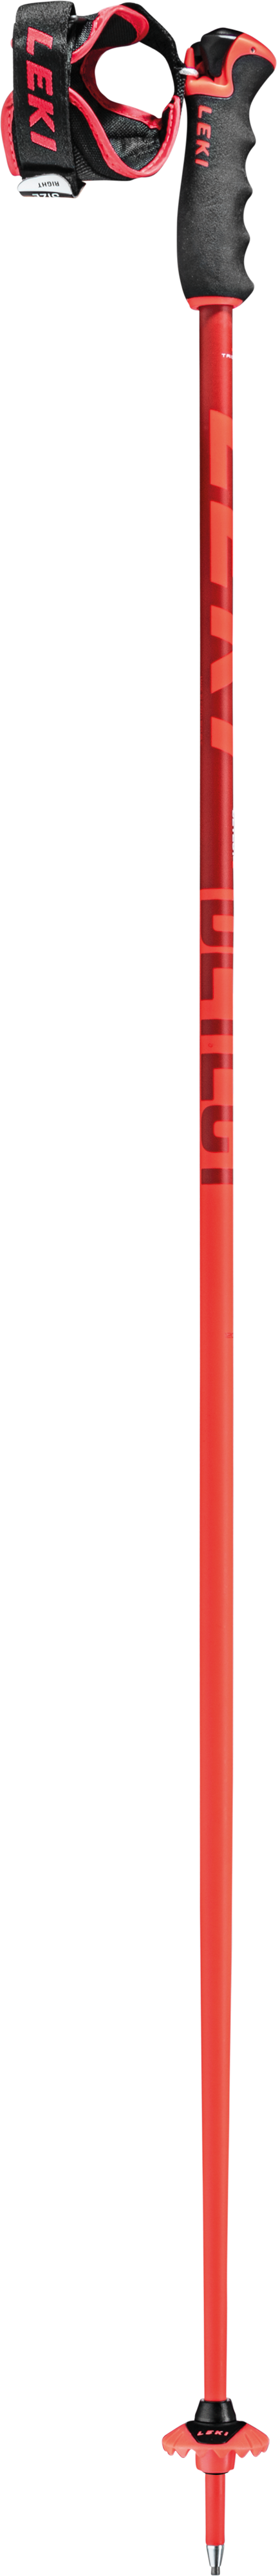 Detect S 120cm